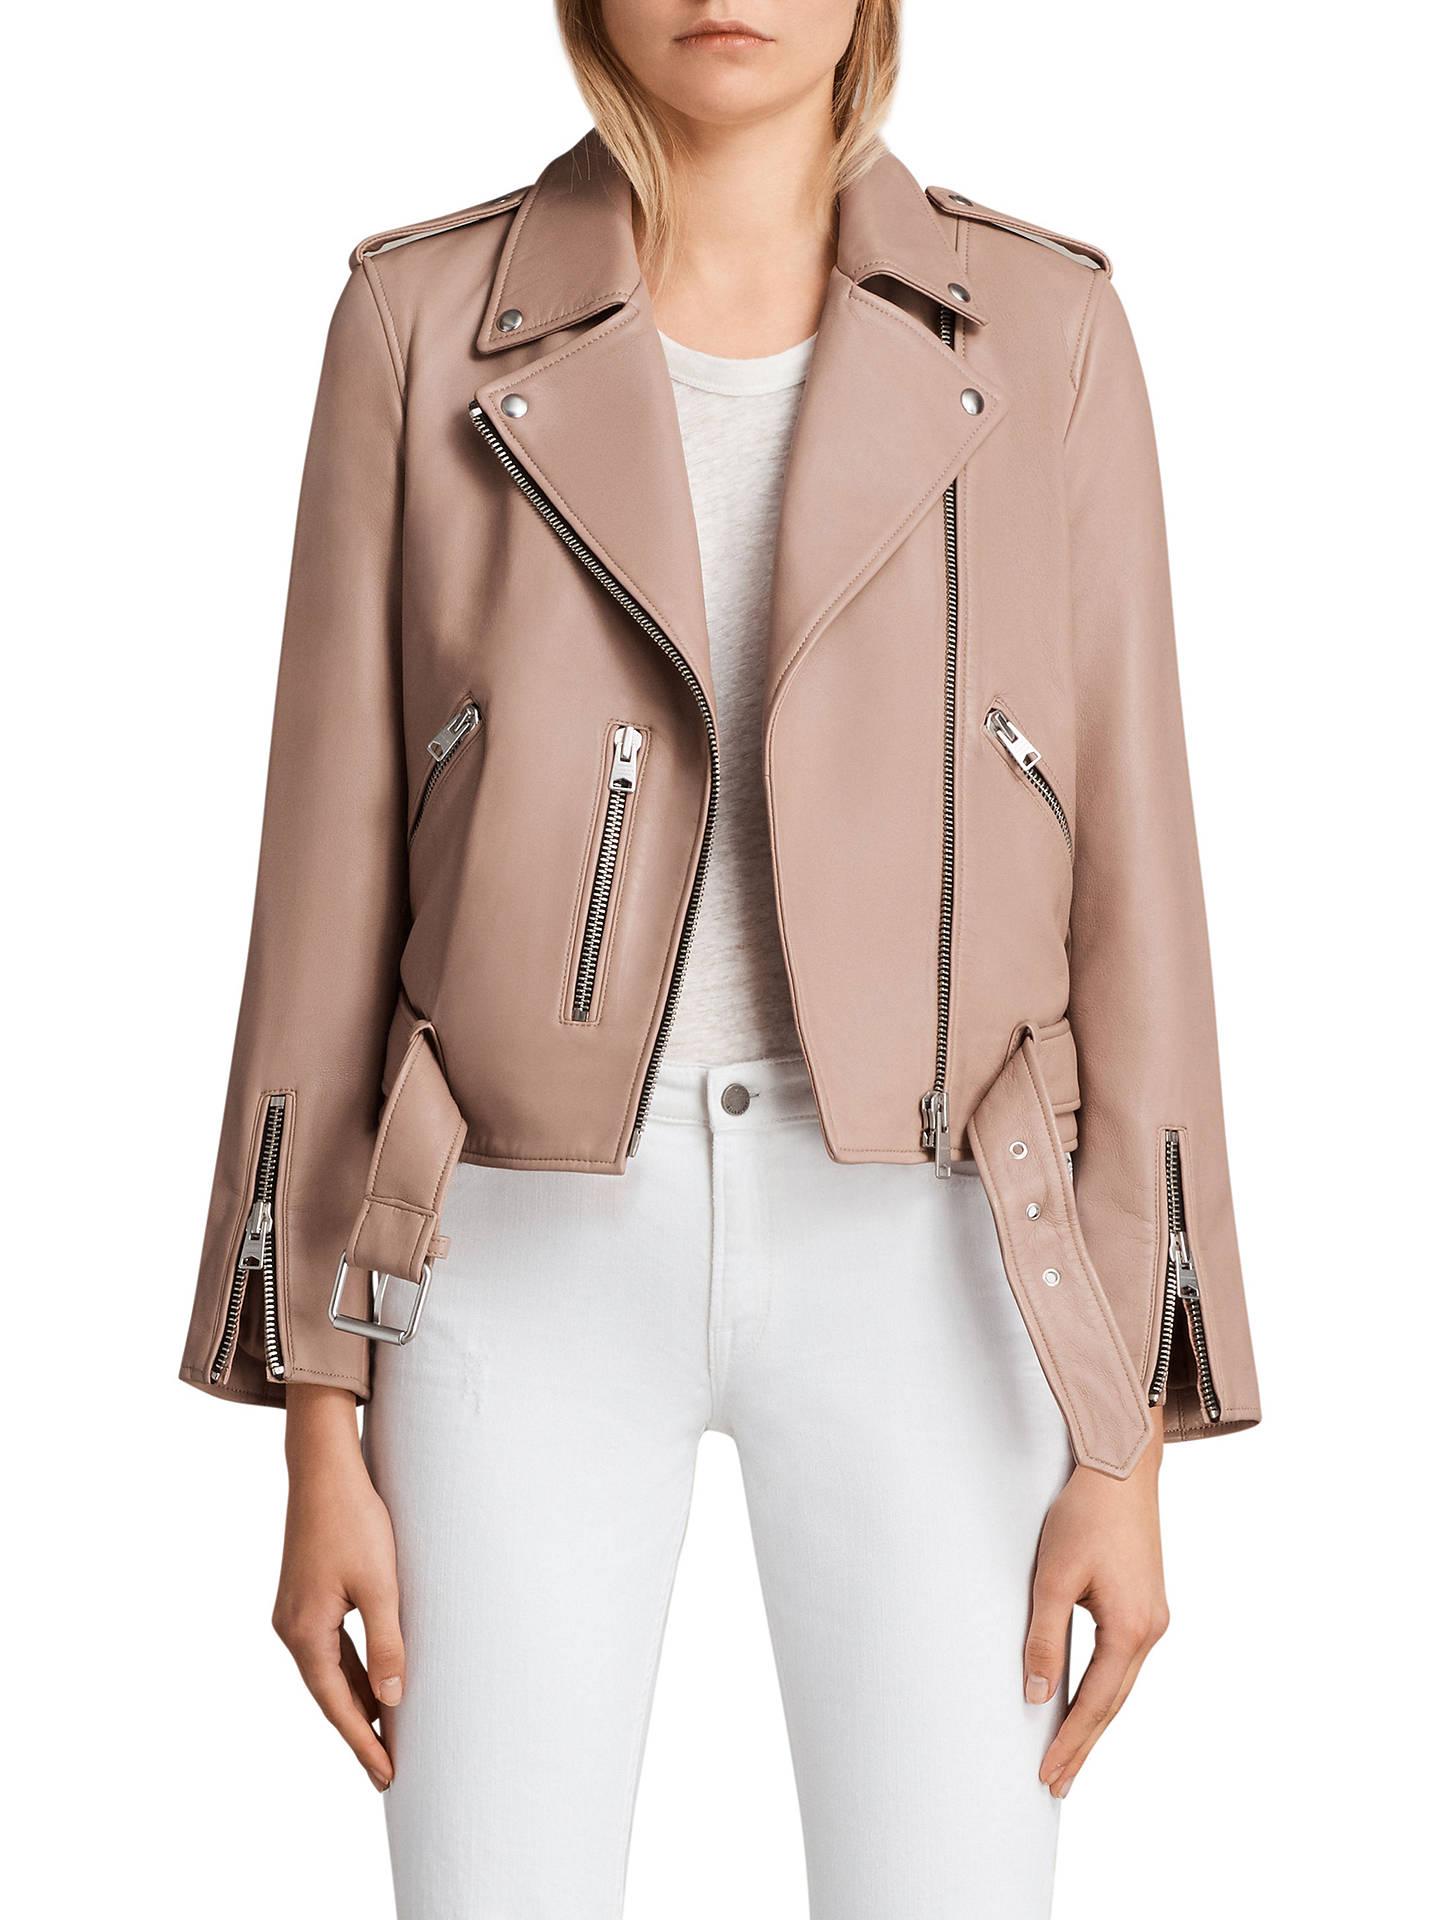 5597c5f657db1 Buy AllSaints Balfern Biker Jacket, Blush Pink, 6 Online at johnlewis.com  ...